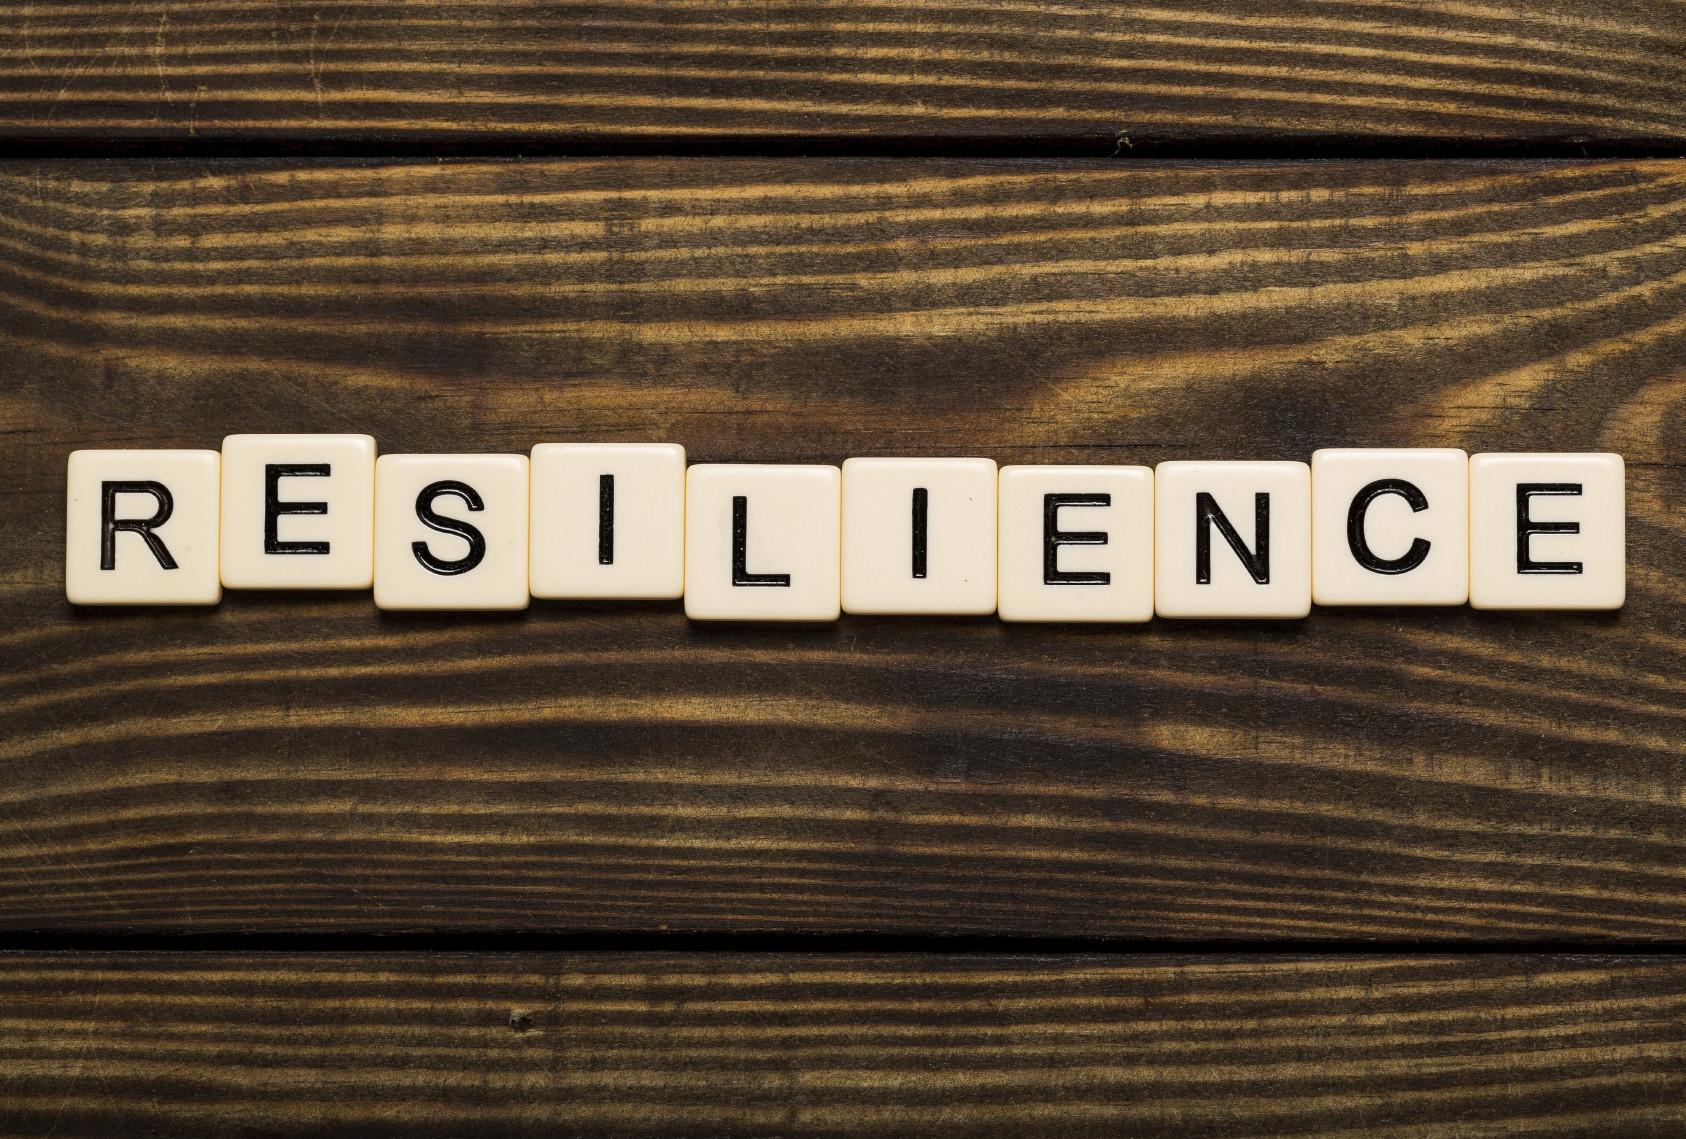 resiliance-positive-psych-mind-moodiStock_000063226387_Medium